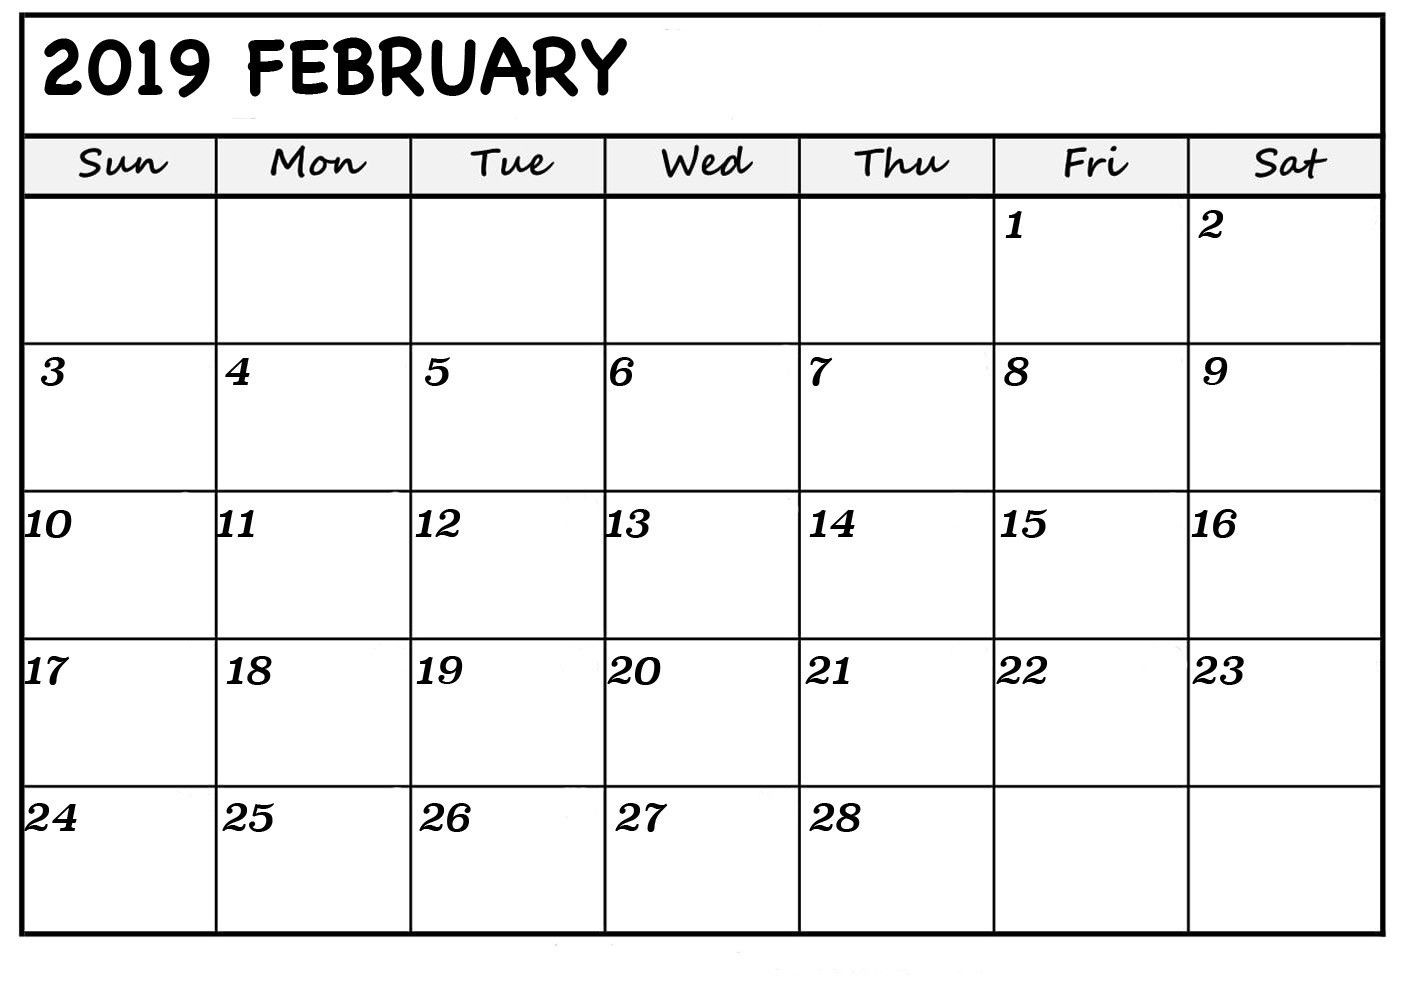 February 2019 Template Editable Calendar Download Free